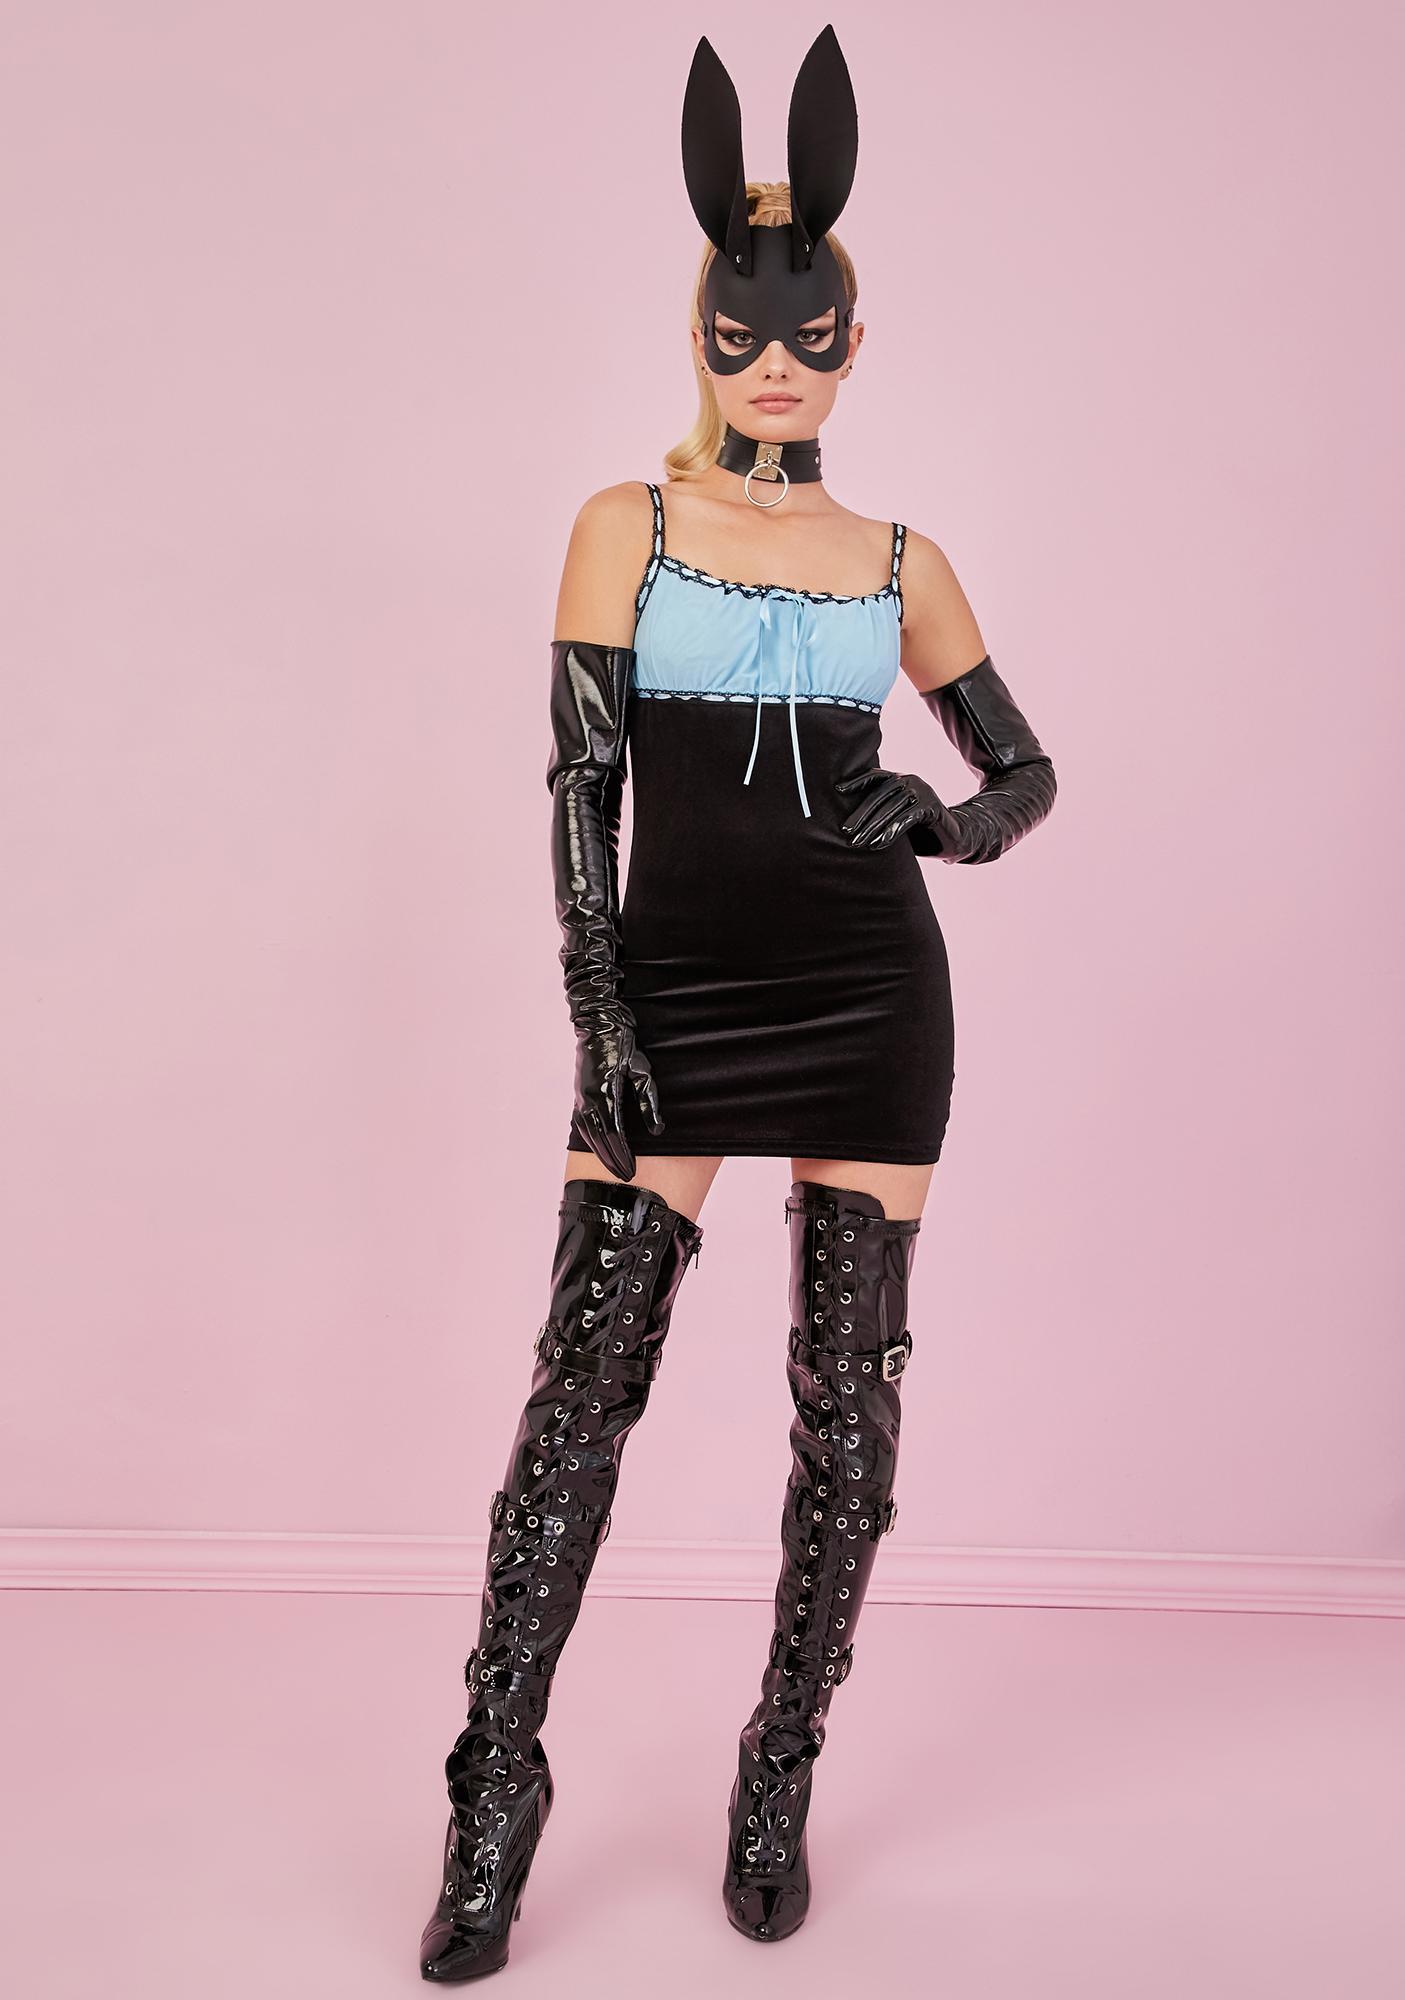 Sugar Thrillz Periwinkle PS I Love You Velvet Dress